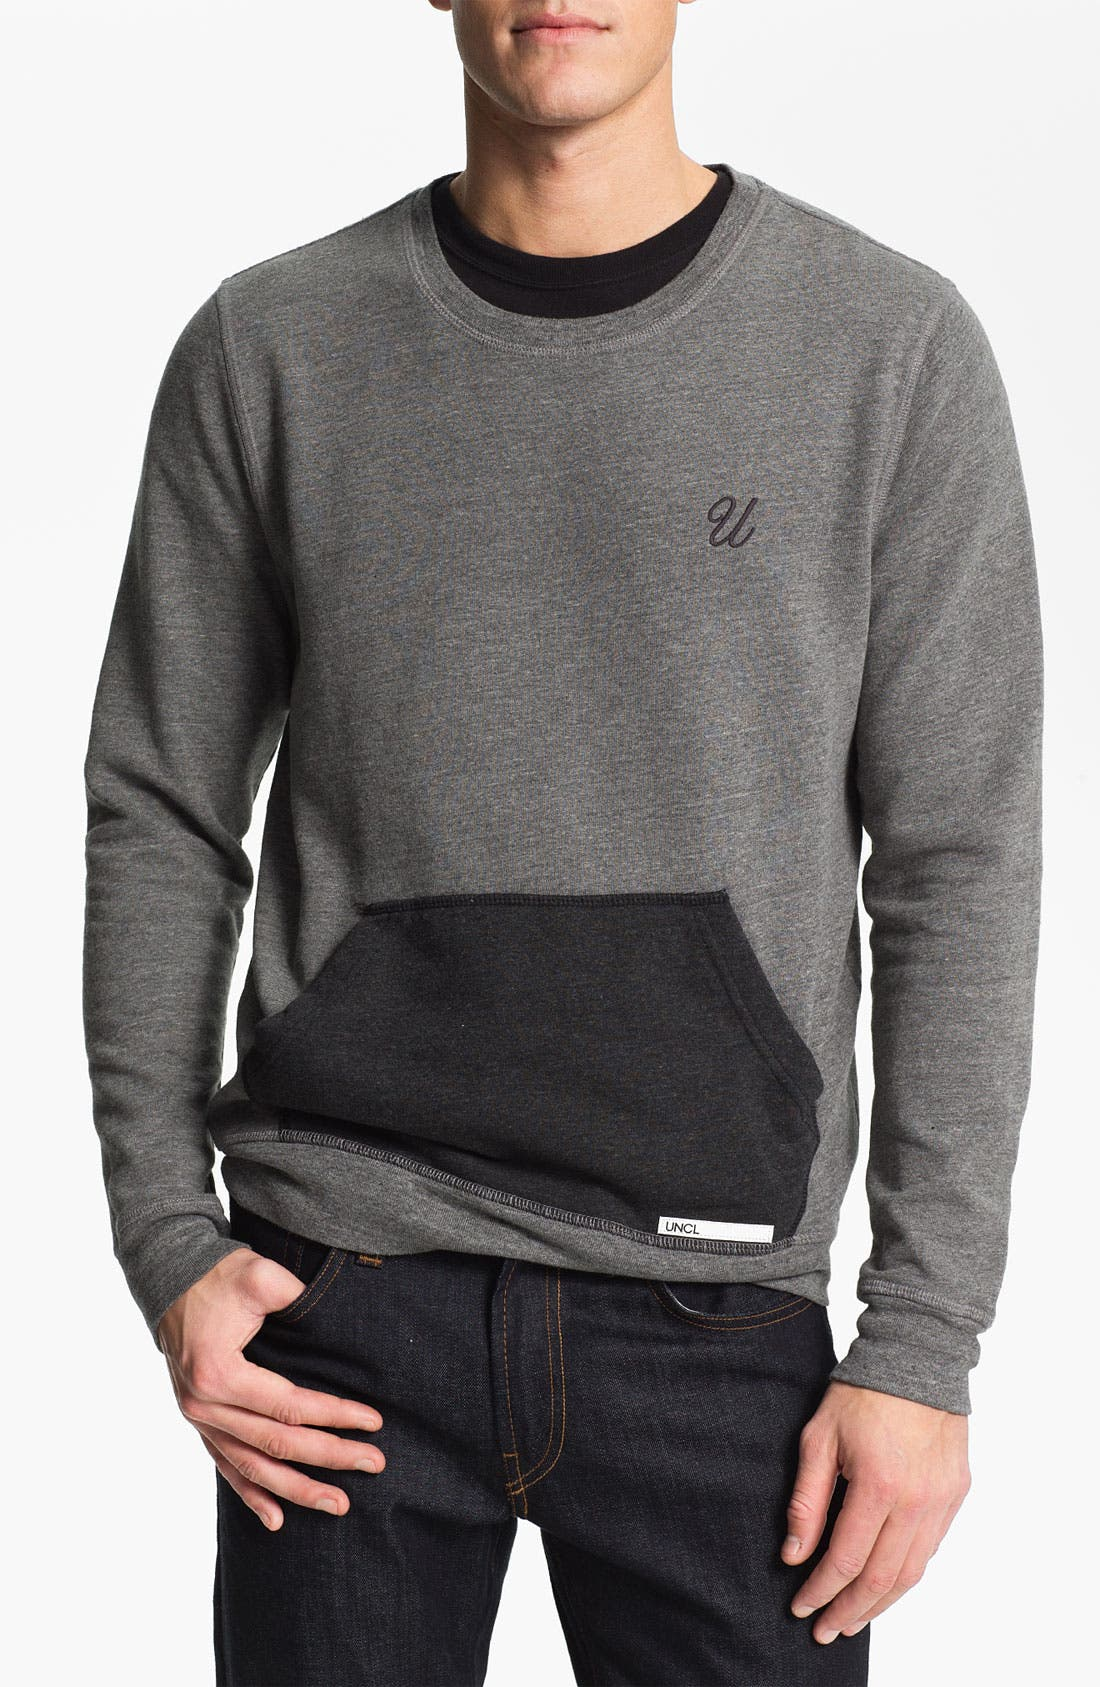 Alternate Image 1 Selected - UNCL Crewneck Fleece Sweatshirt